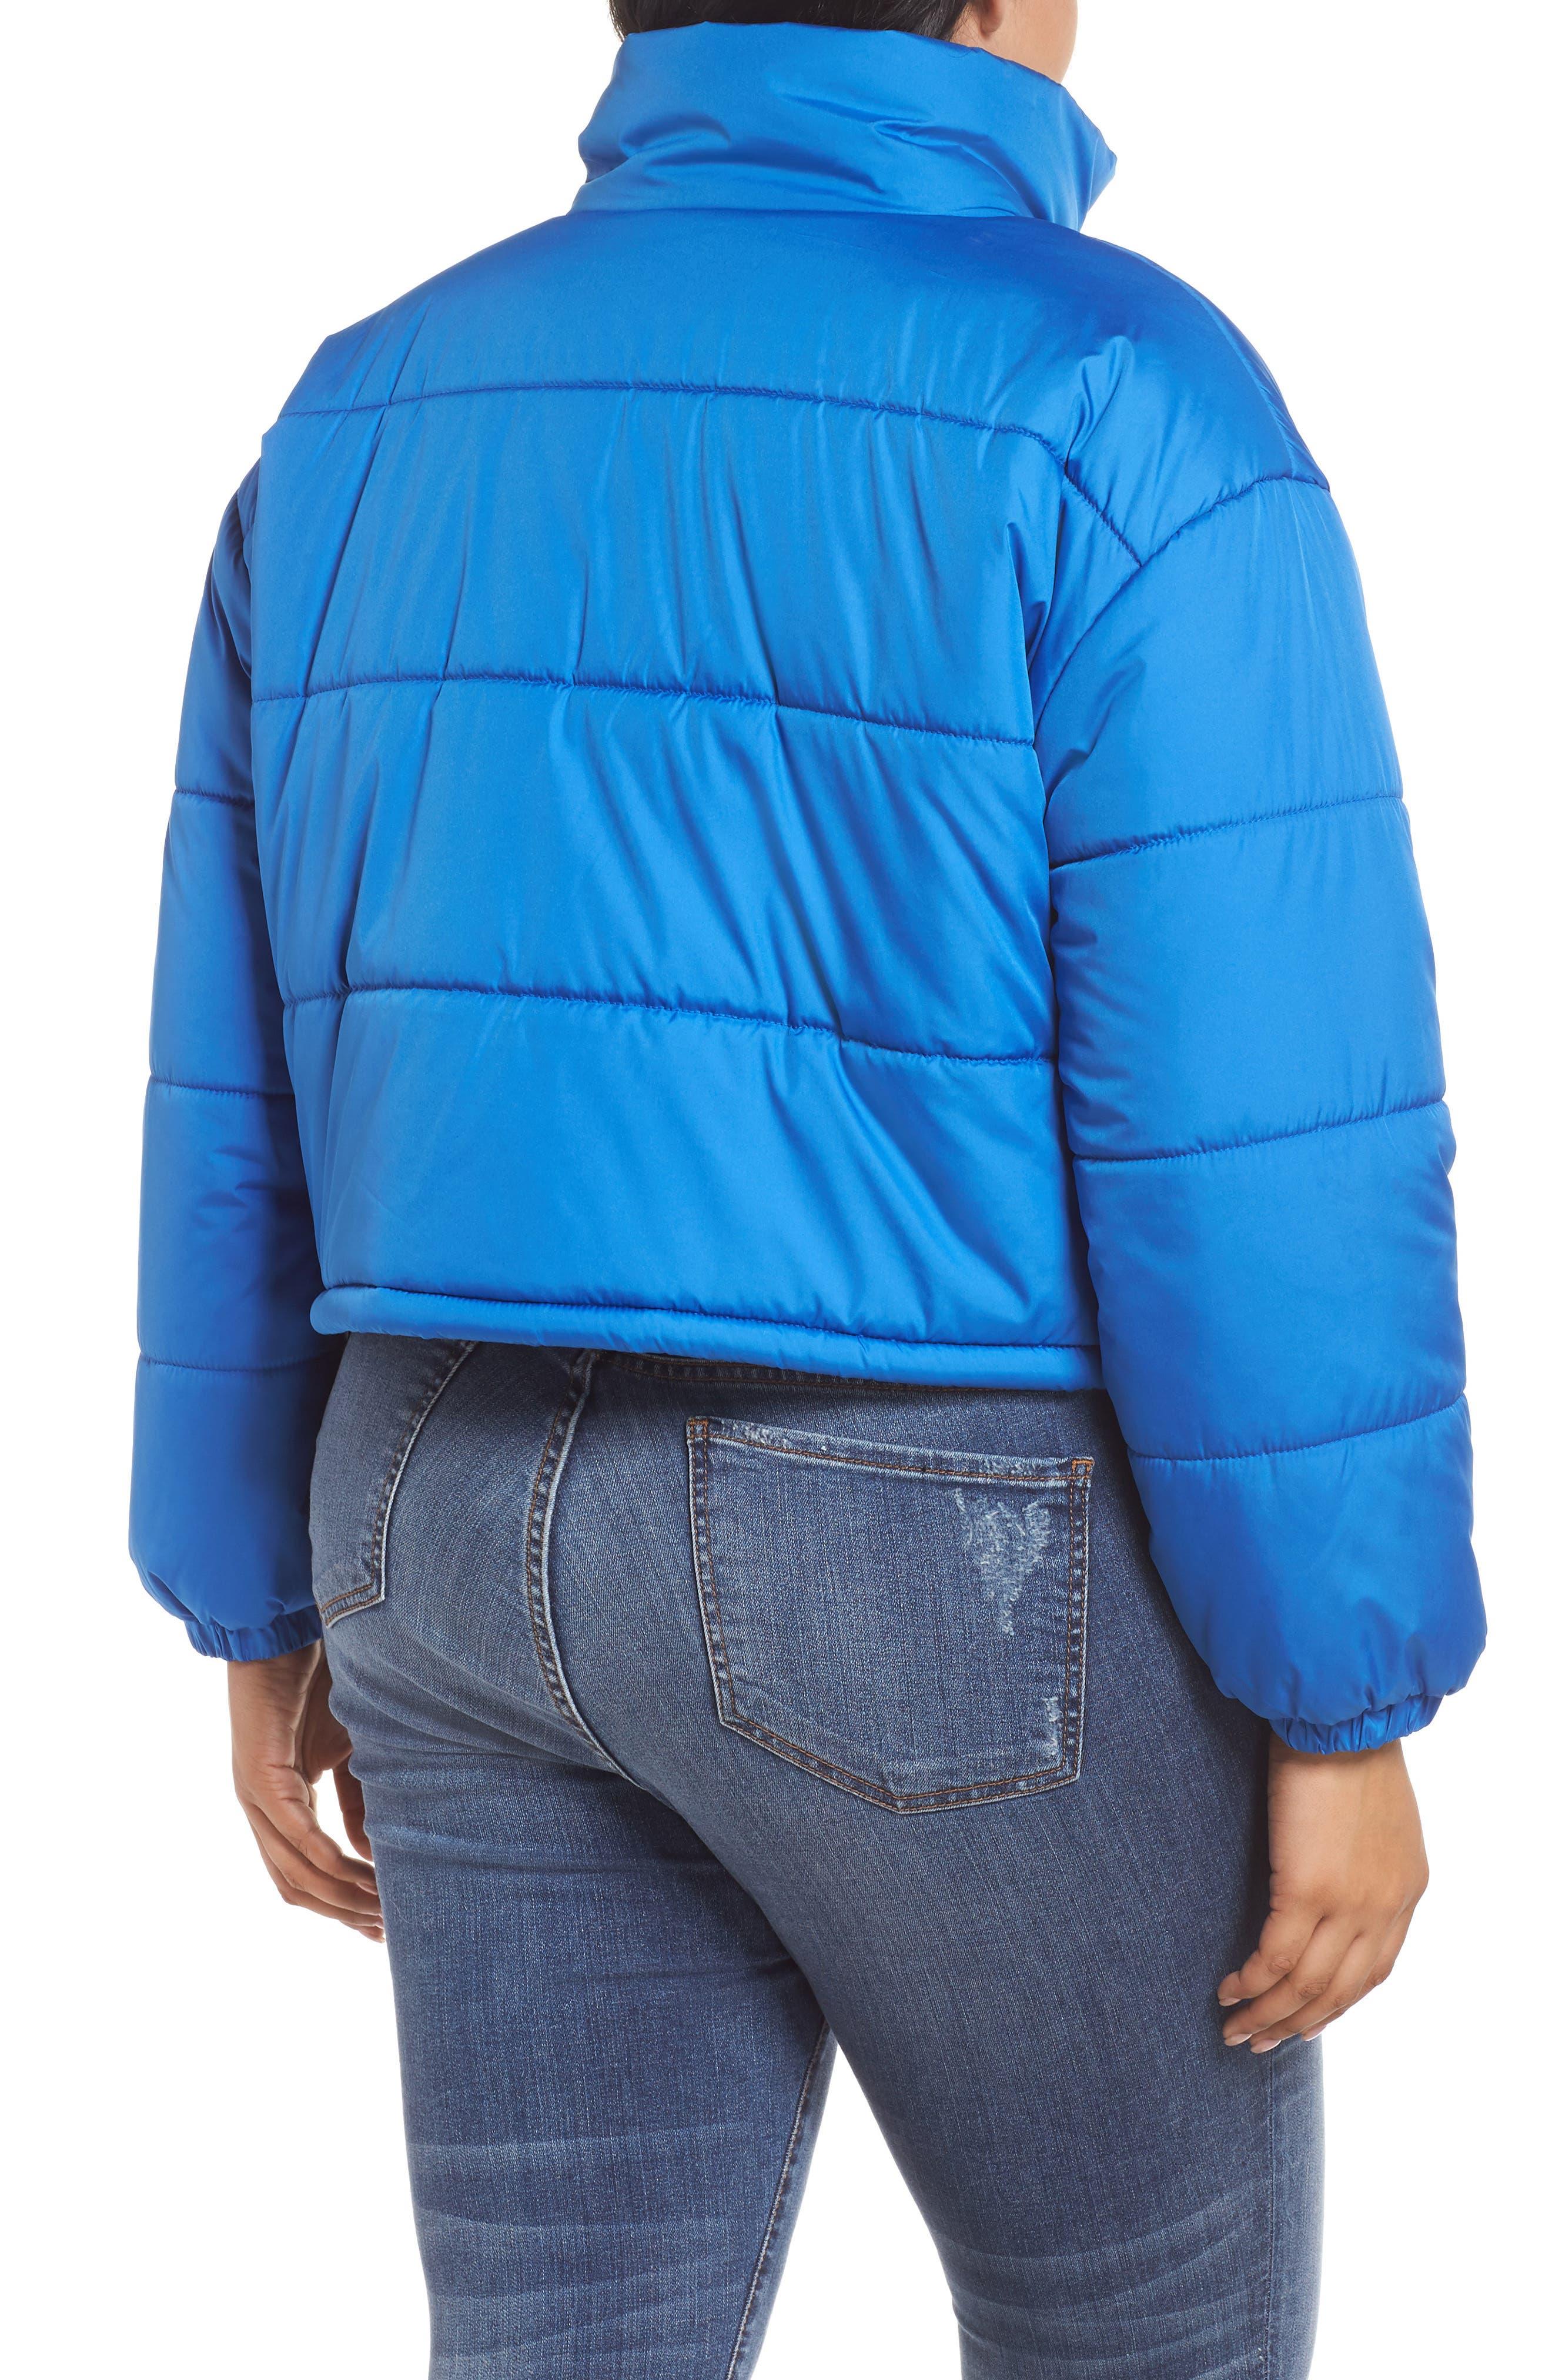 Crop Puffer Jacket,                             Alternate thumbnail 9, color,                             BLUE BOAT